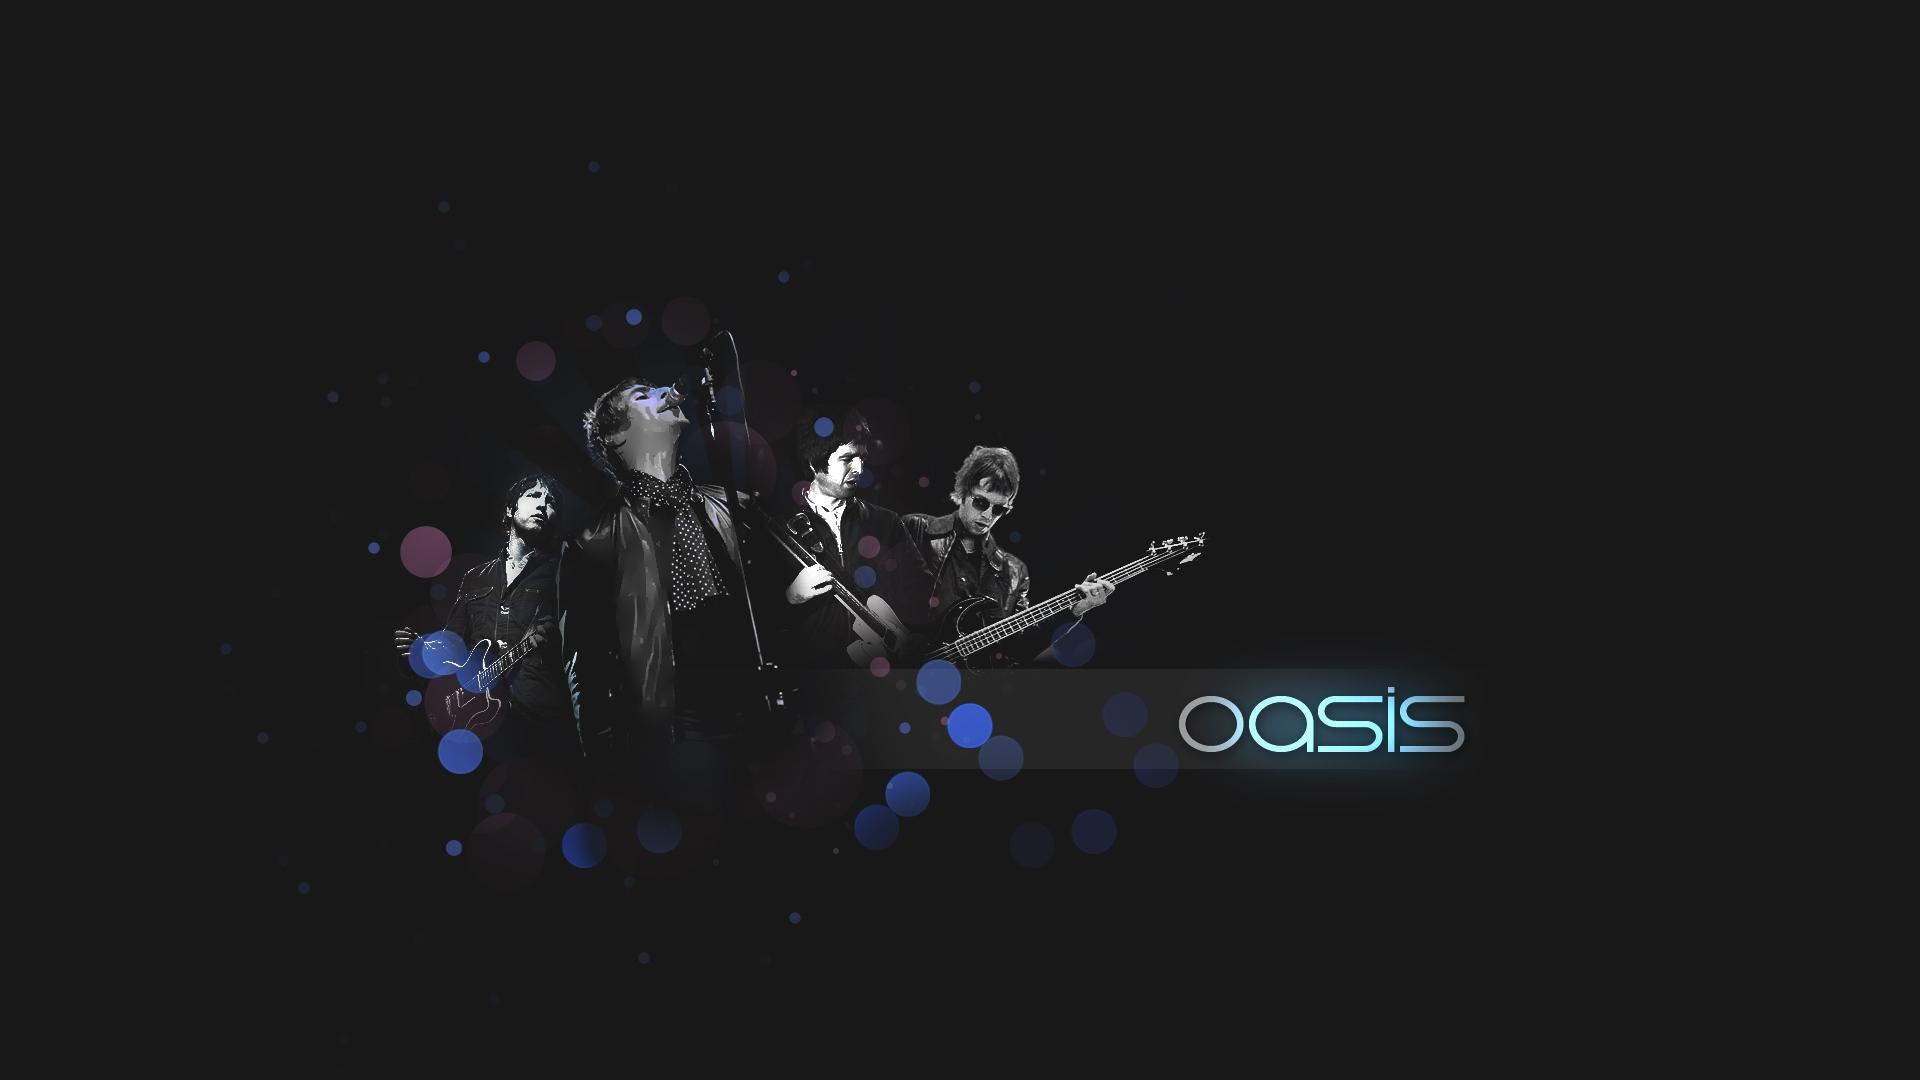 Download Wallpaper 1920x1080 oasis, band, members, sign ... Oasis Band Wallpaper